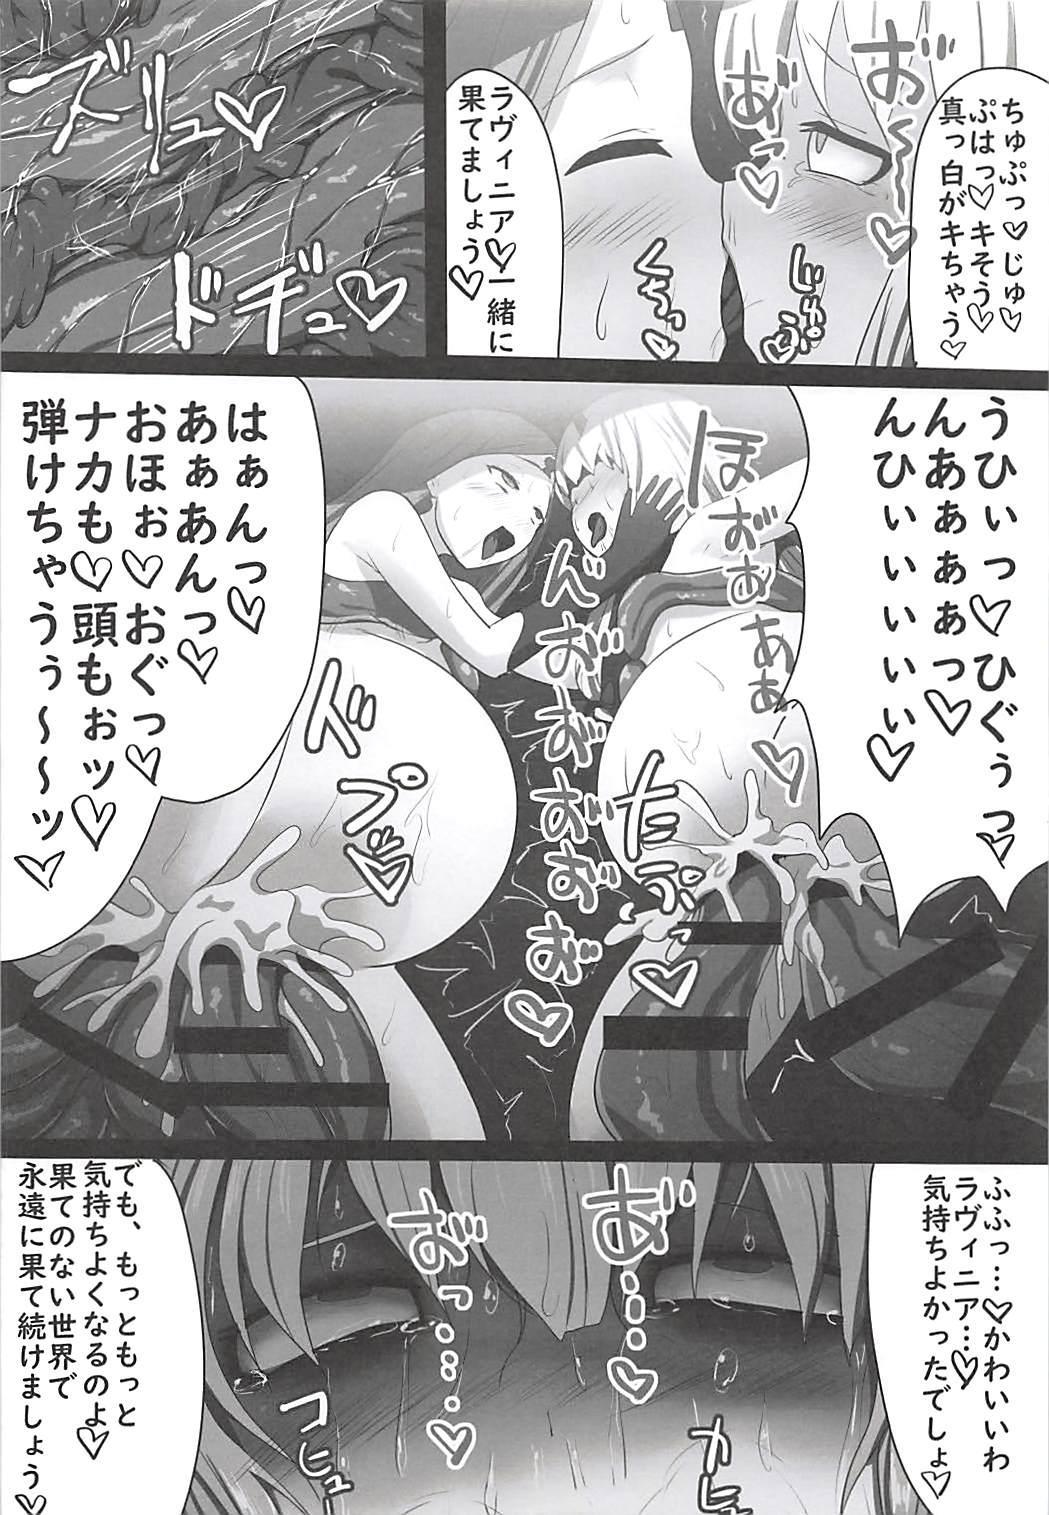 FGO Ashu Tokuiten Goudou - Ashu Reiyoku Danshou 55